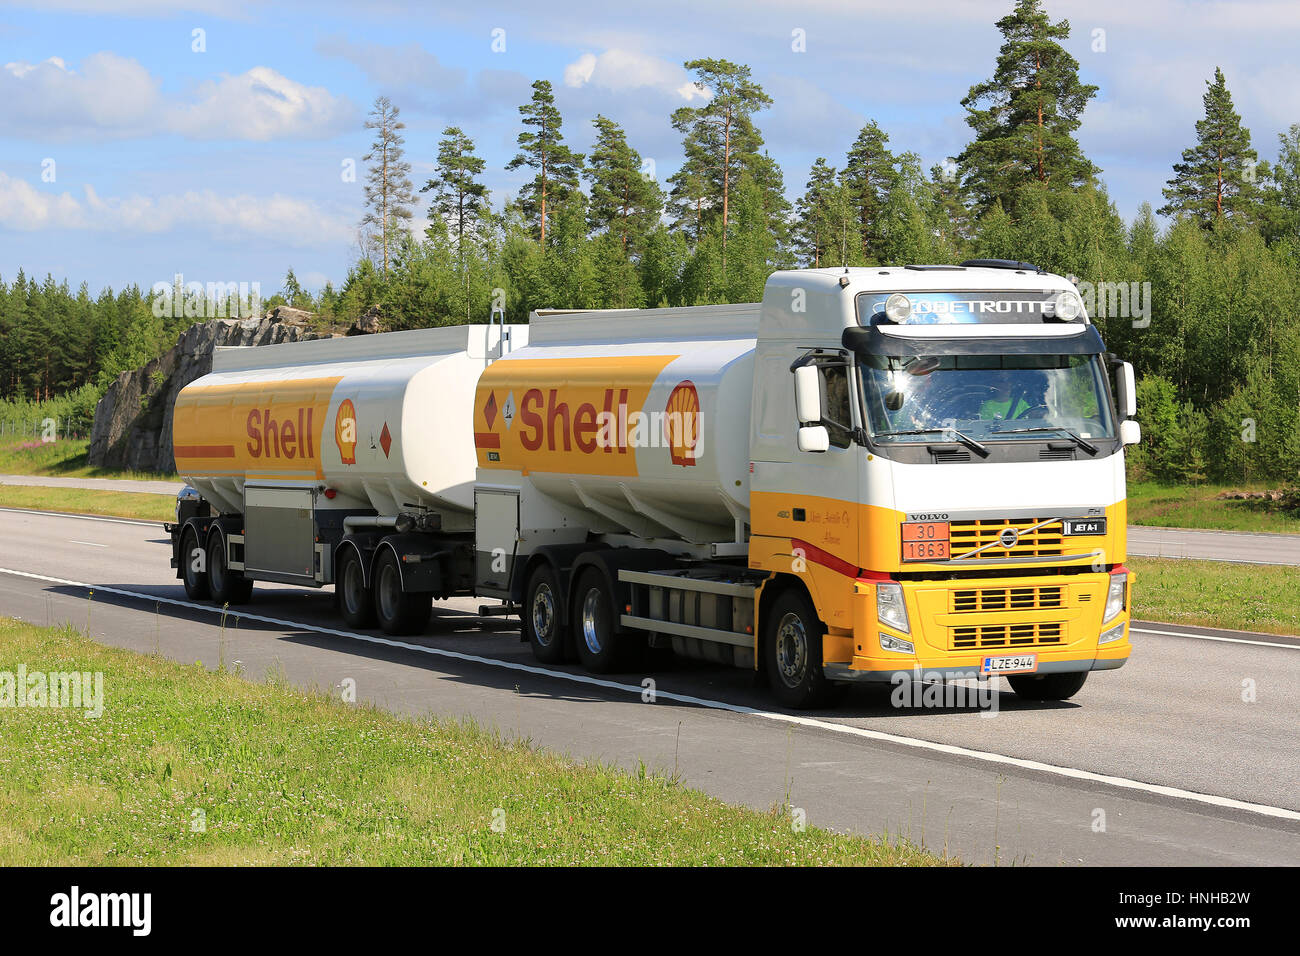 Inredning ok hyra lastbil : Truck Oil Tank On Road Stock Photos & Truck Oil Tank On Road Stock ...